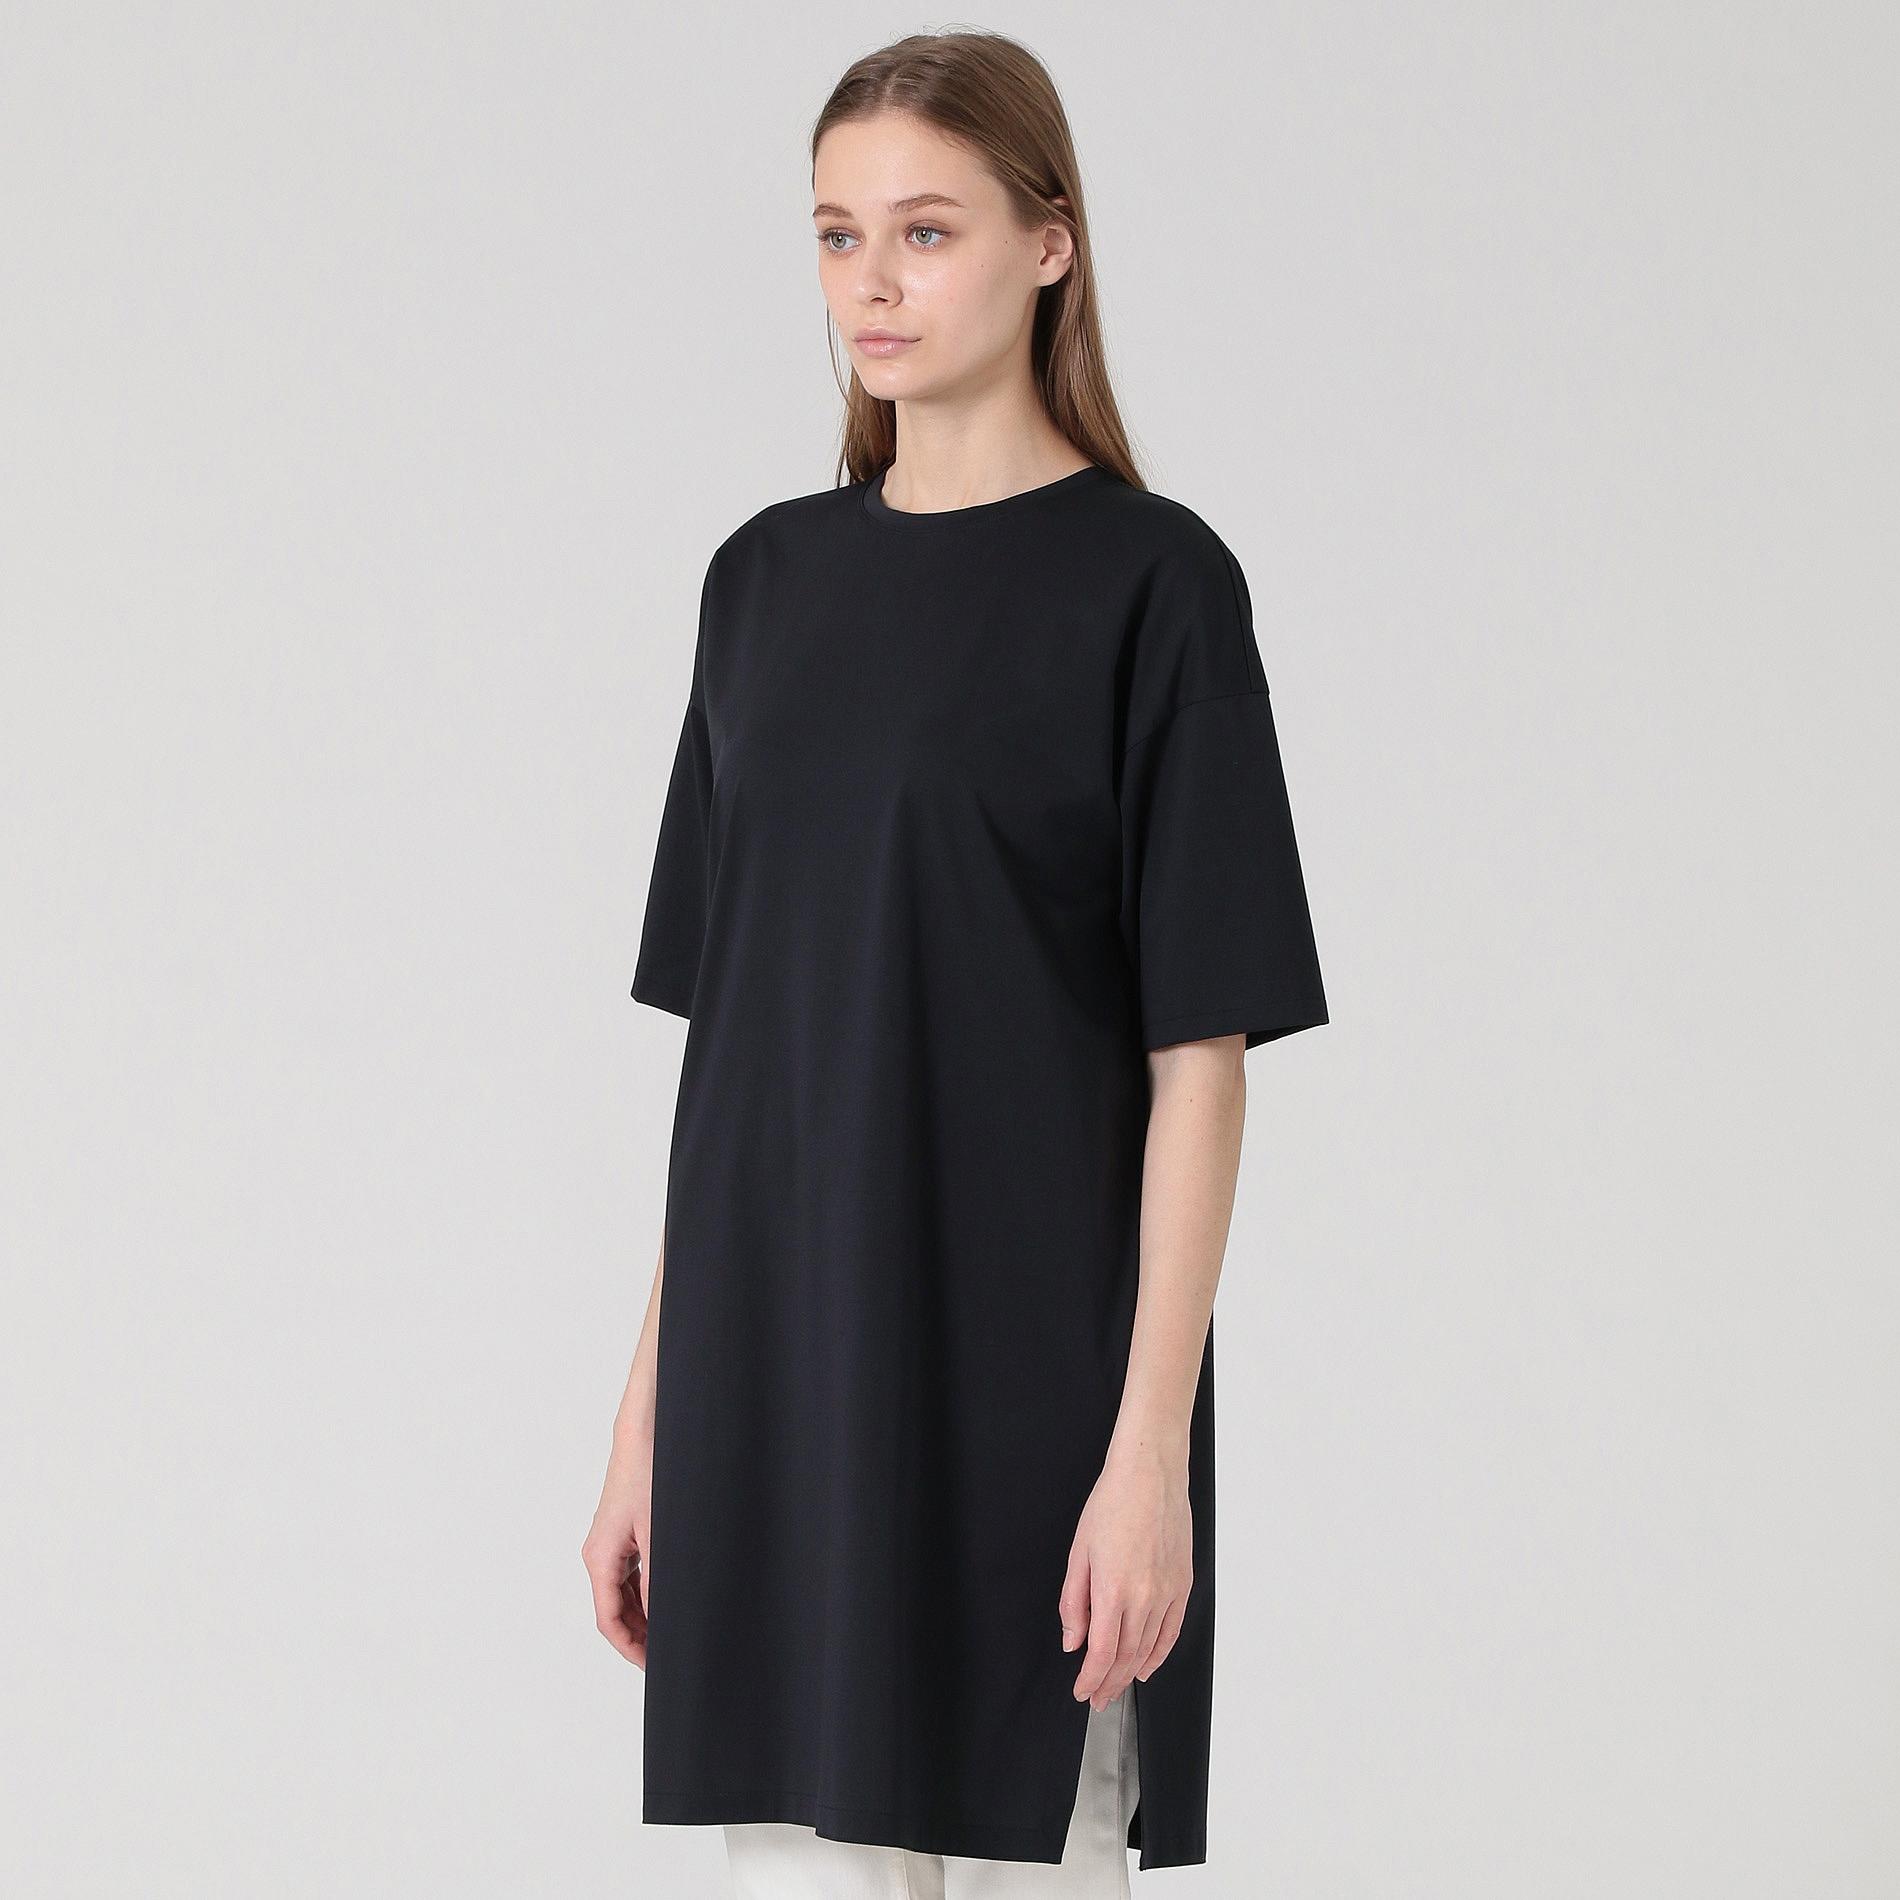 【The Essential Collection】ライトポンチチュニックTシャツ